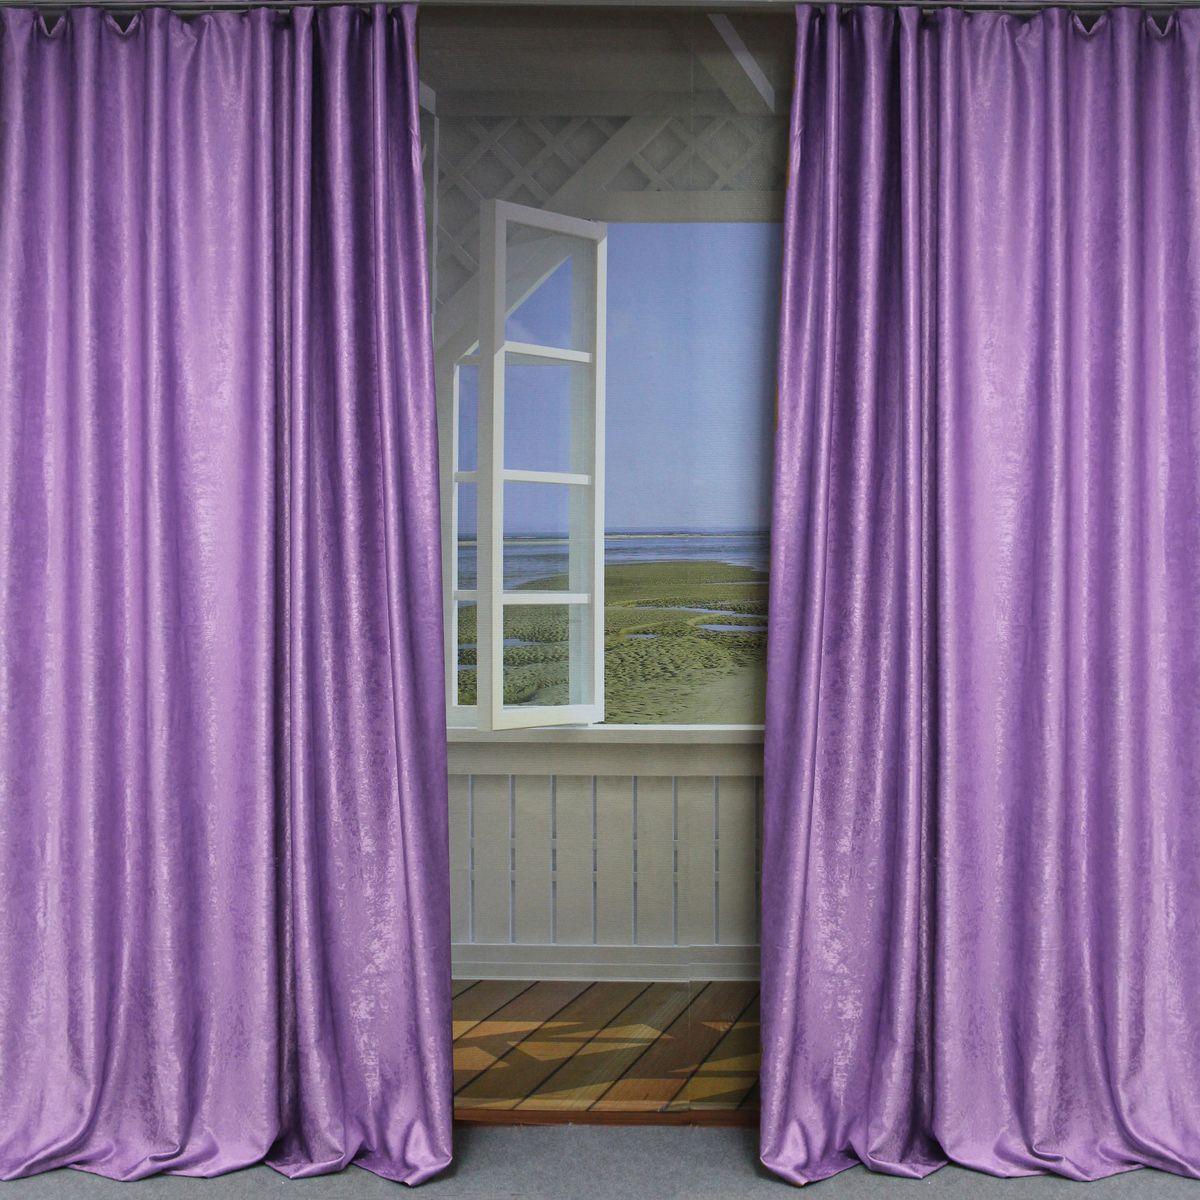 Комплект штор Amore Mio, цвет: сиреневый, высота 270 см. RR 8156-6029 покрывало amore mio amore mio mp002xu0e2vh